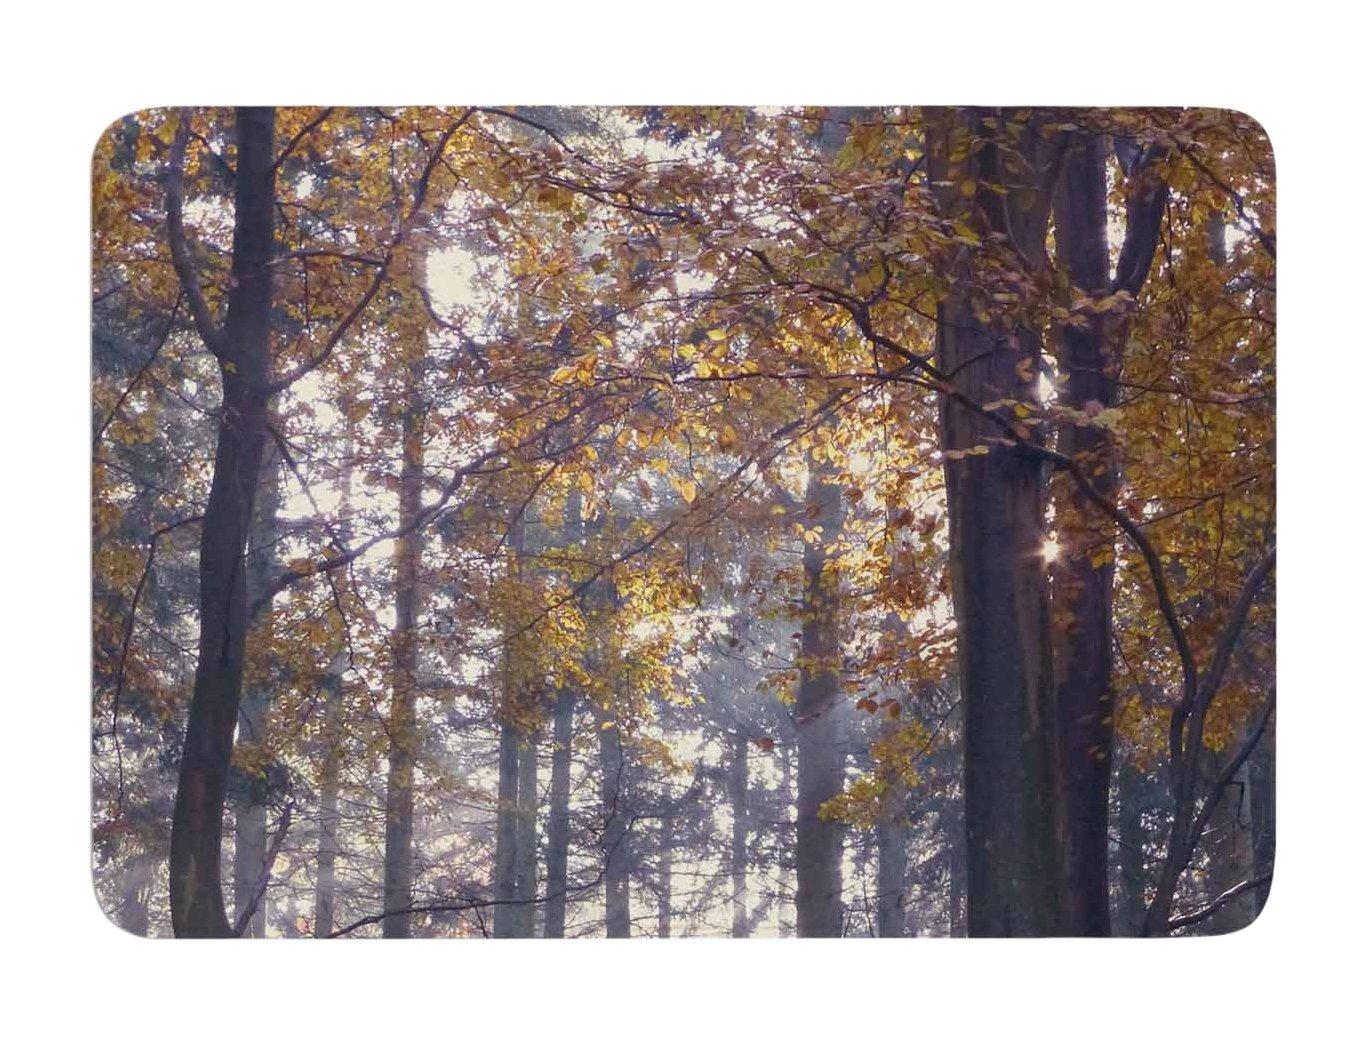 17 X 24 17 by 24-Inch Kess InHouse Alison Coxon Autumn Sunbeams Trees Photography Memory Foam Bath Mat